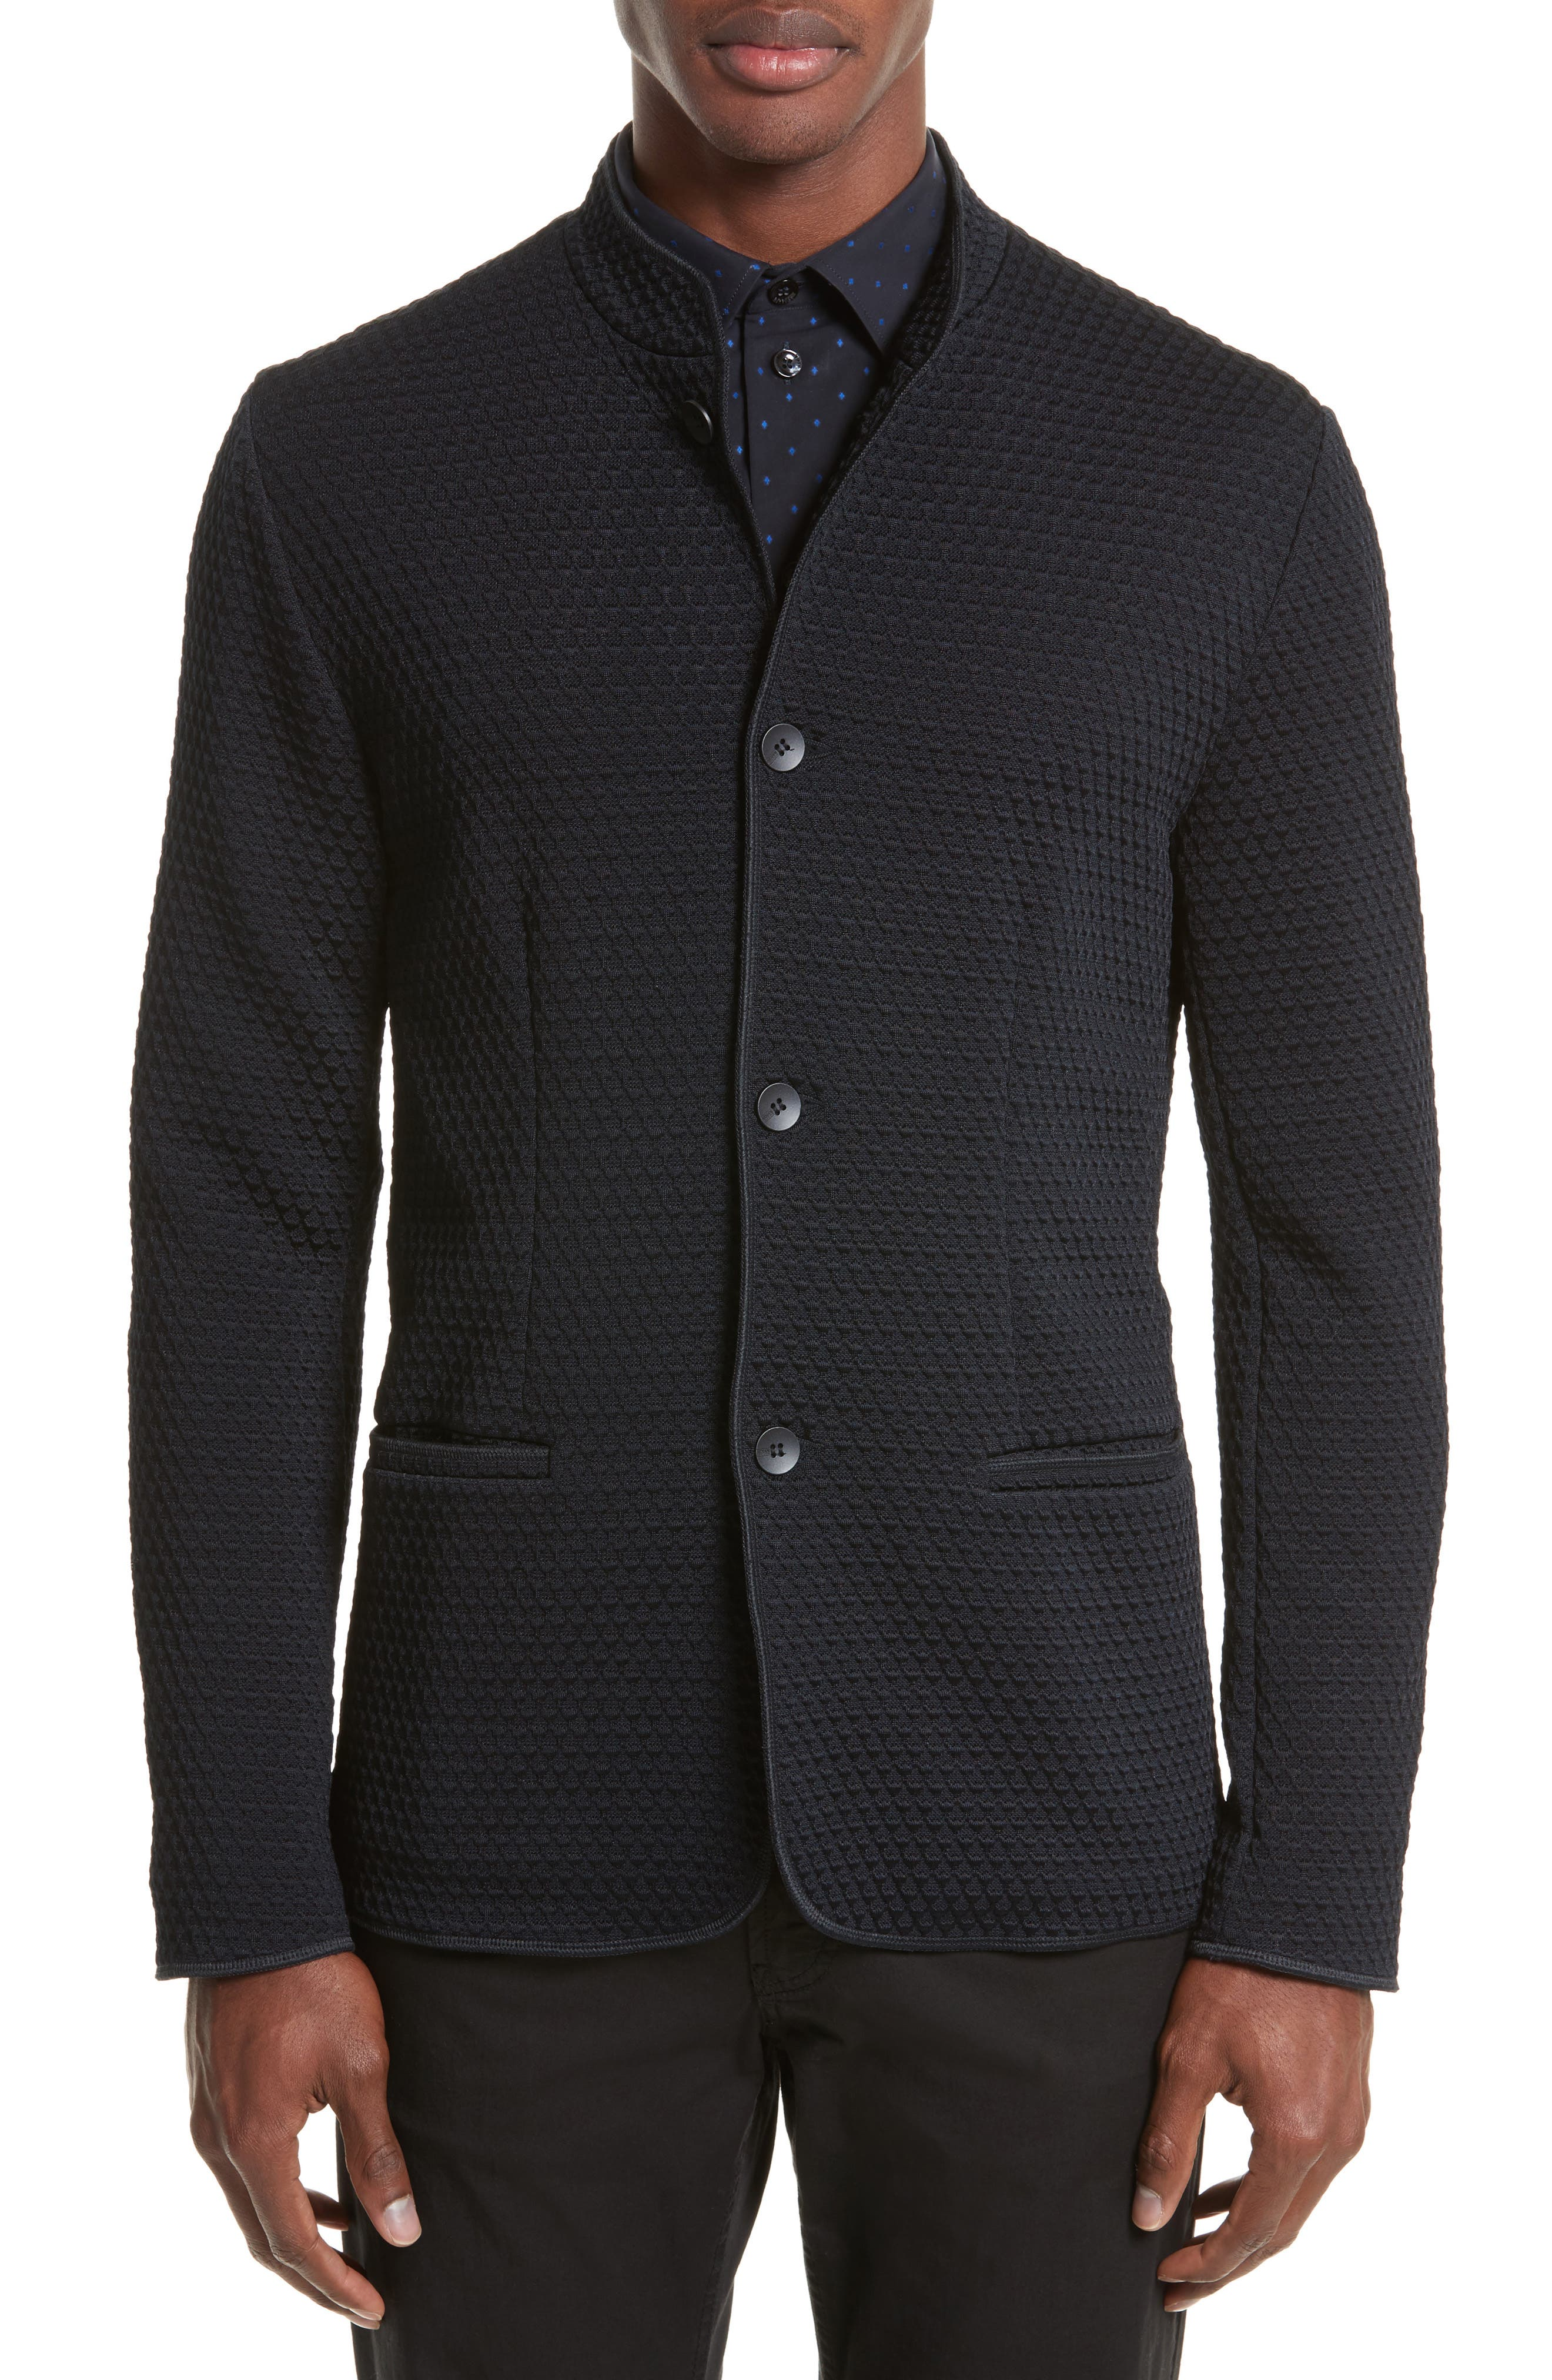 Alternate Image 1 Selected - Armani Collezioni Jacquard Button Front Sweater